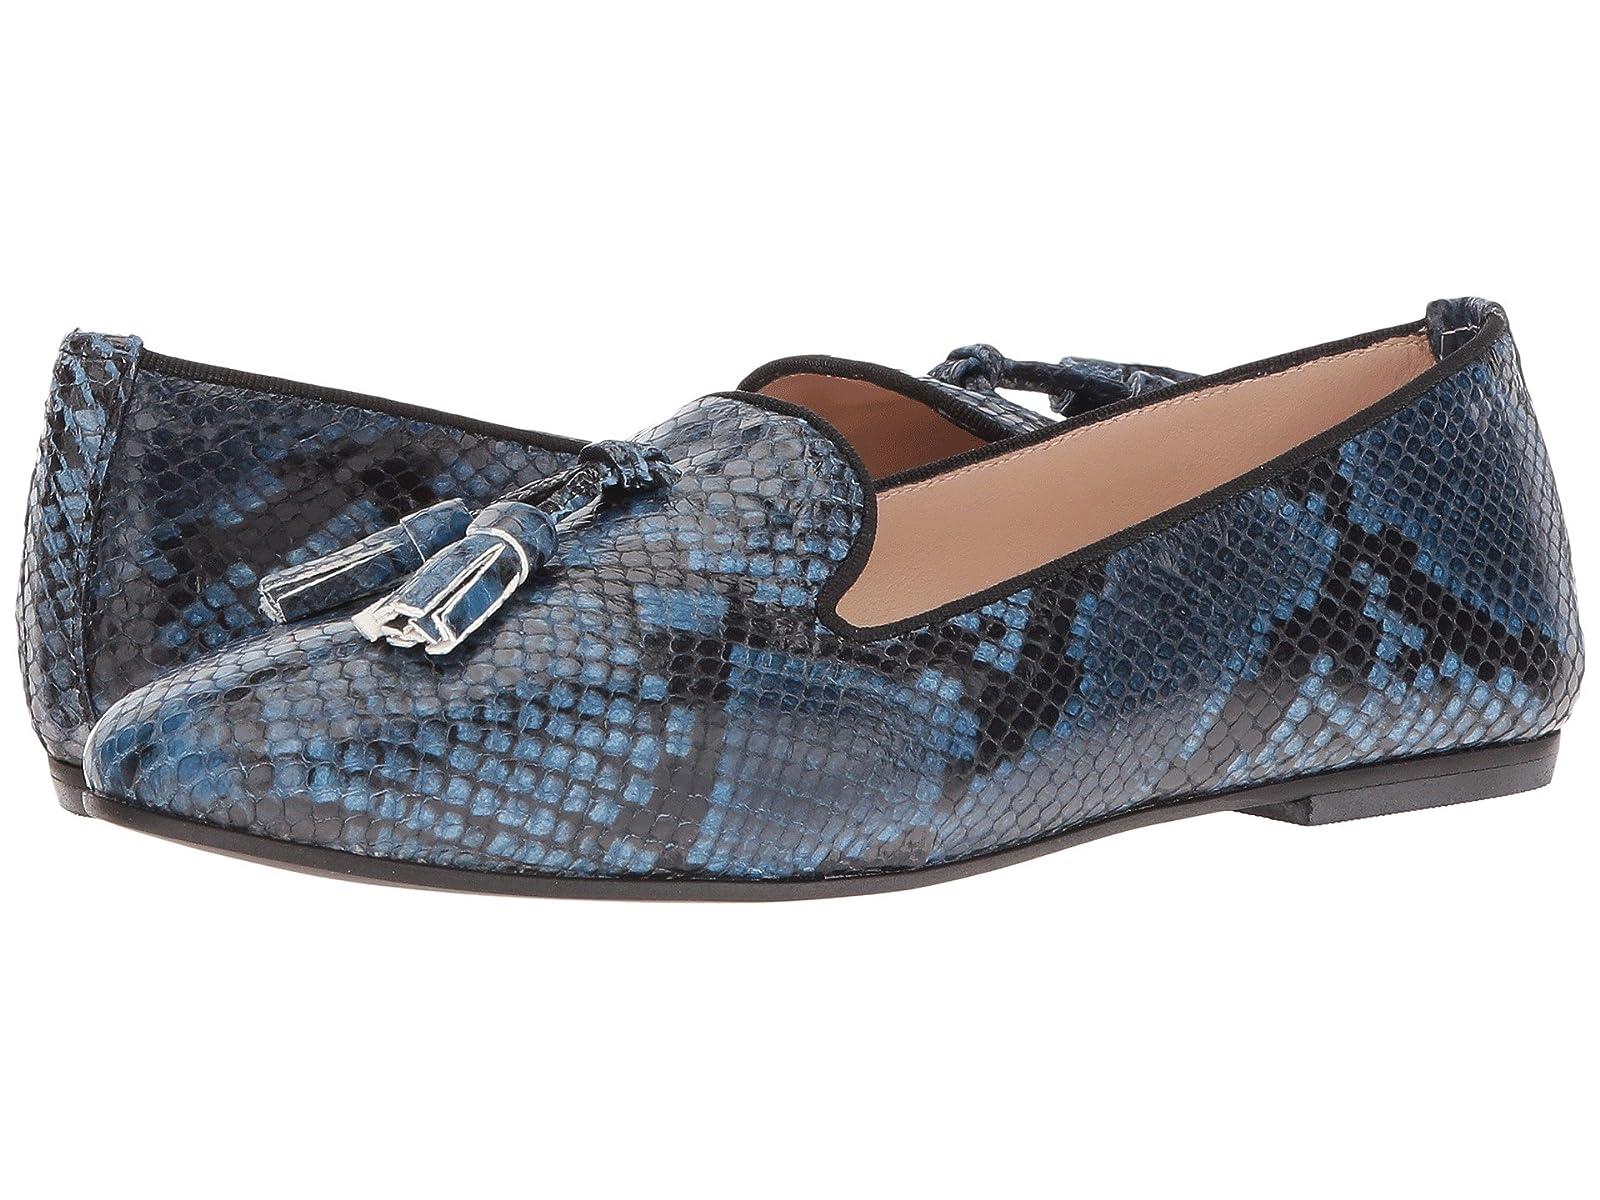 Massimo Matteo Snake Tassel Slip-OnCheap and distinctive eye-catching shoes